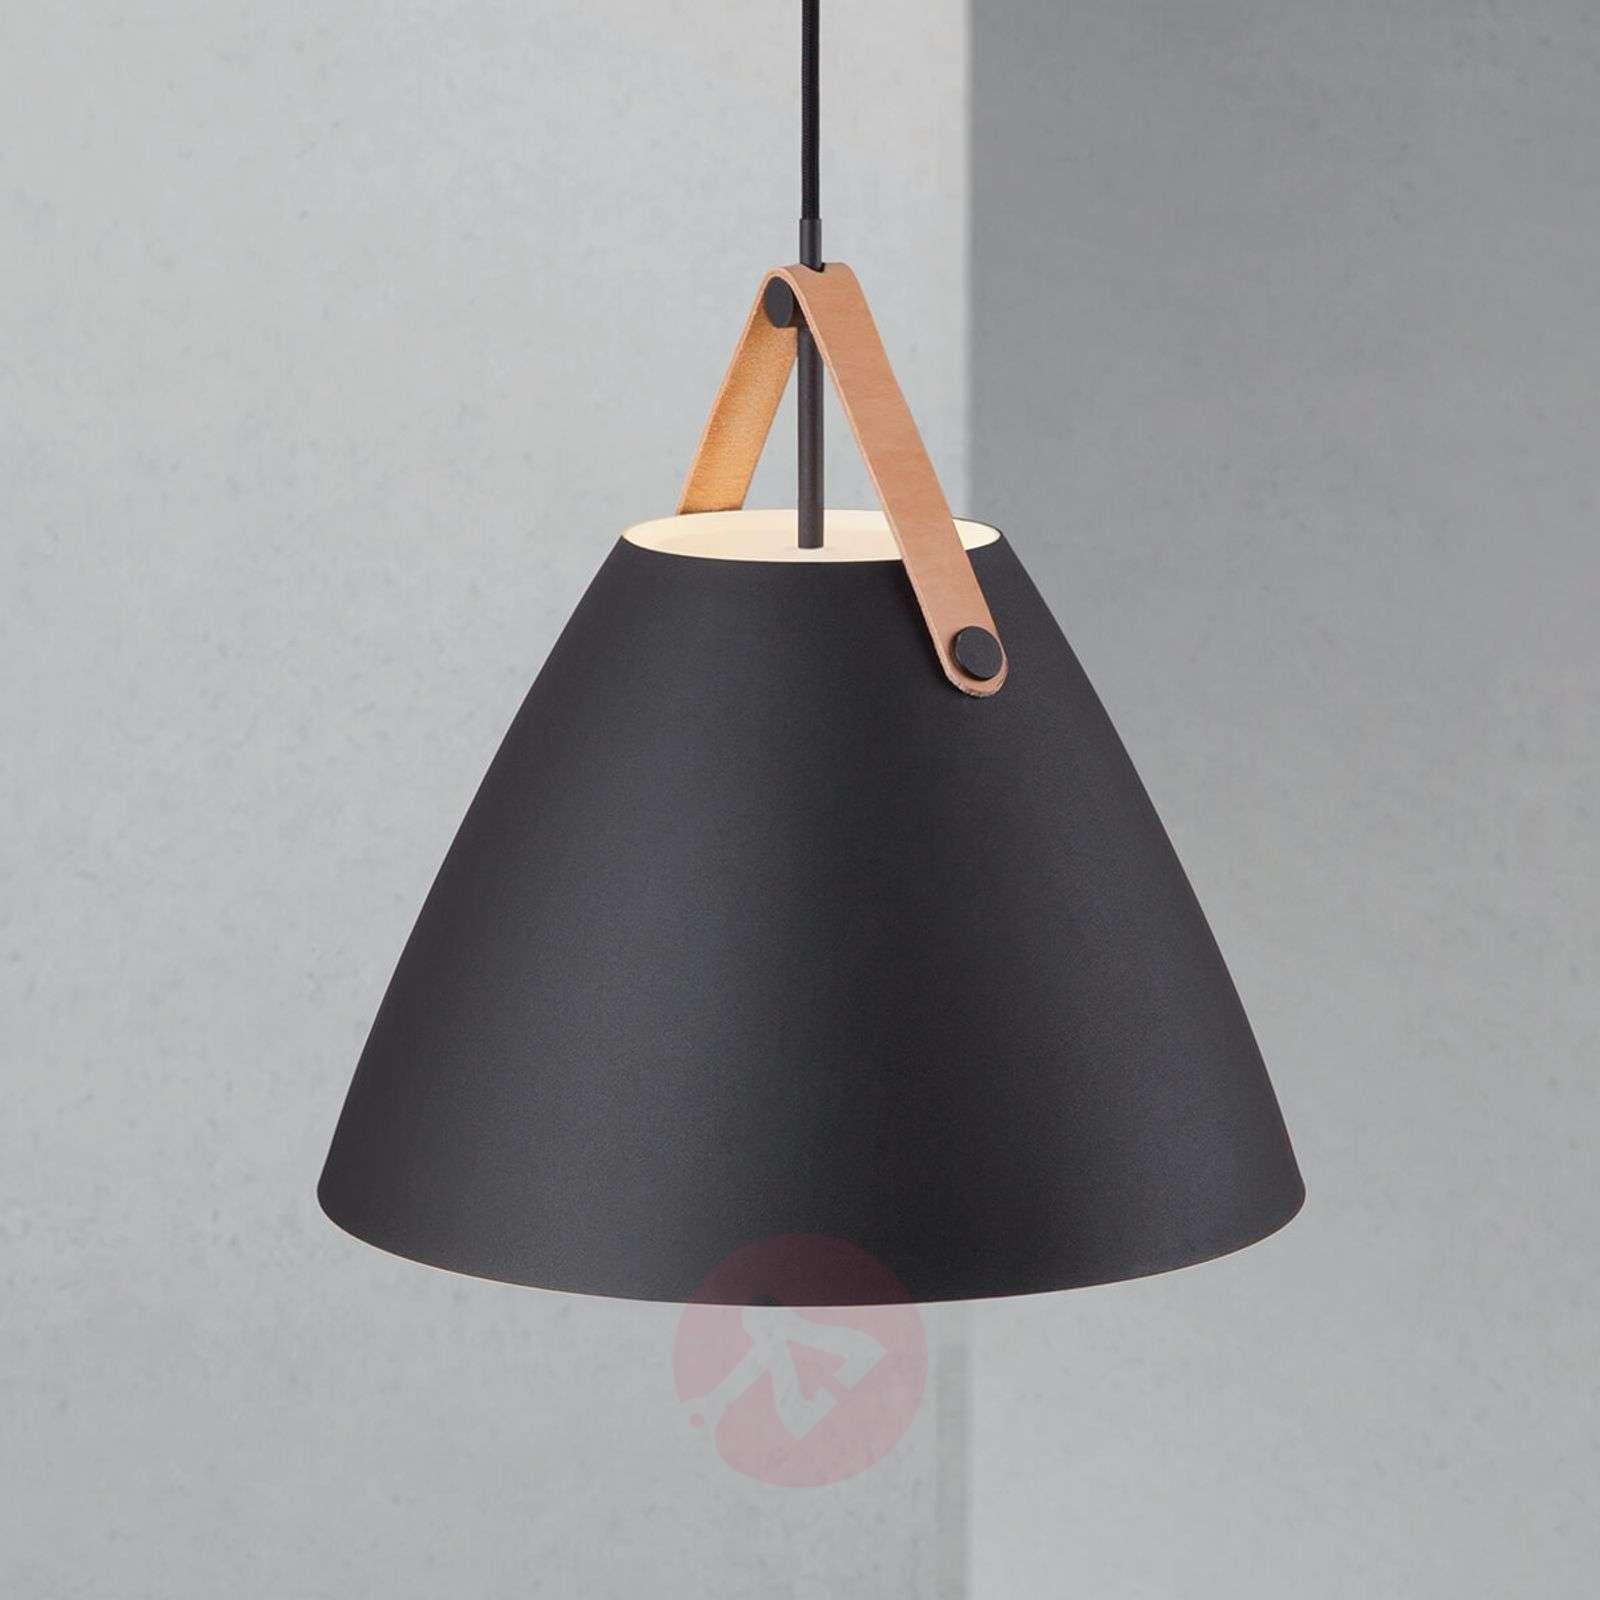 Strap LED hanging light-7006046-01